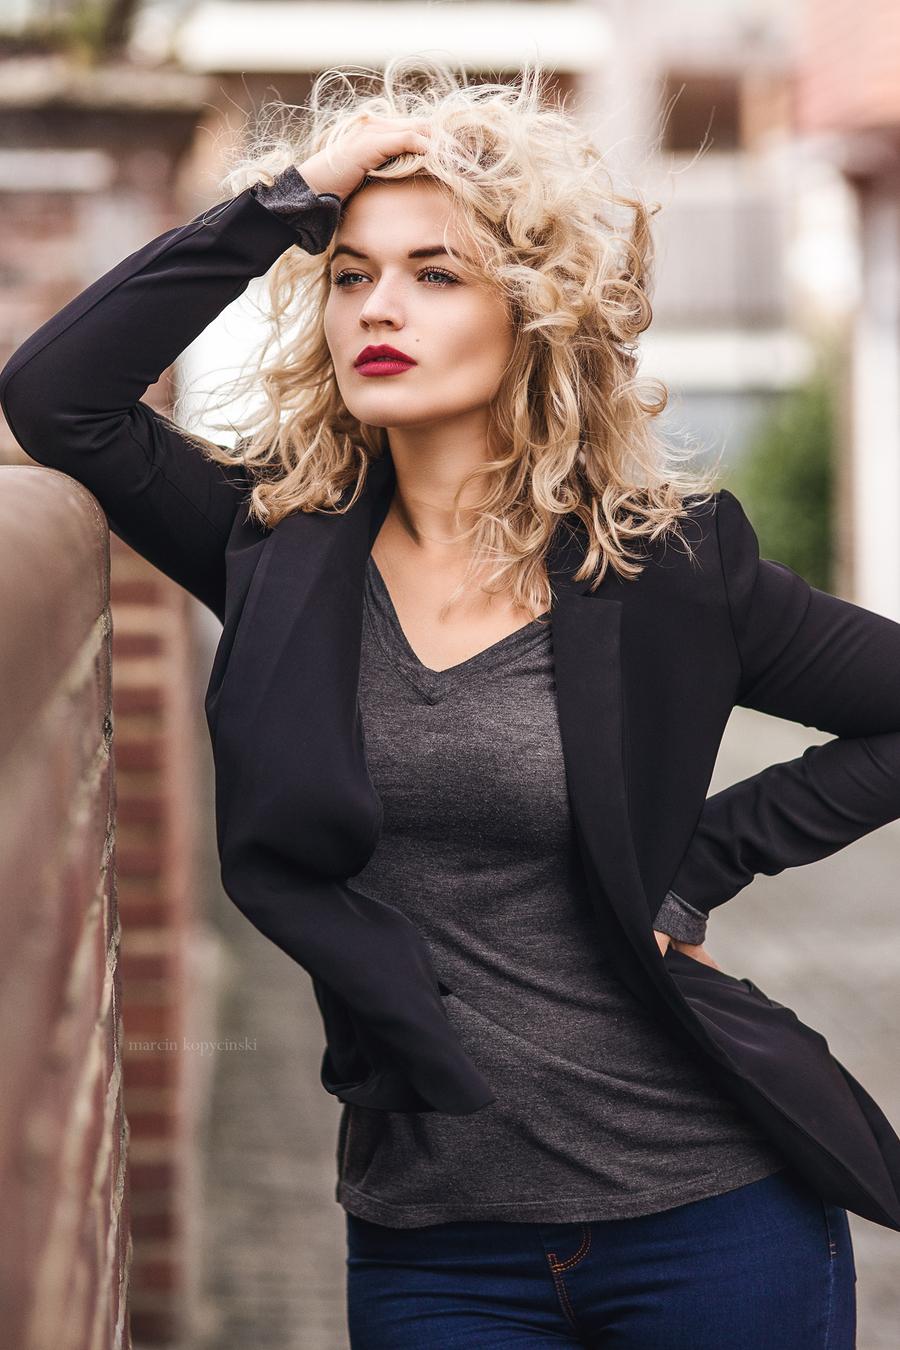 Hyperballad / Photography by Marcin K, Model Jessica Megan / Uploaded 9th October 2016 @ 07:25 PM